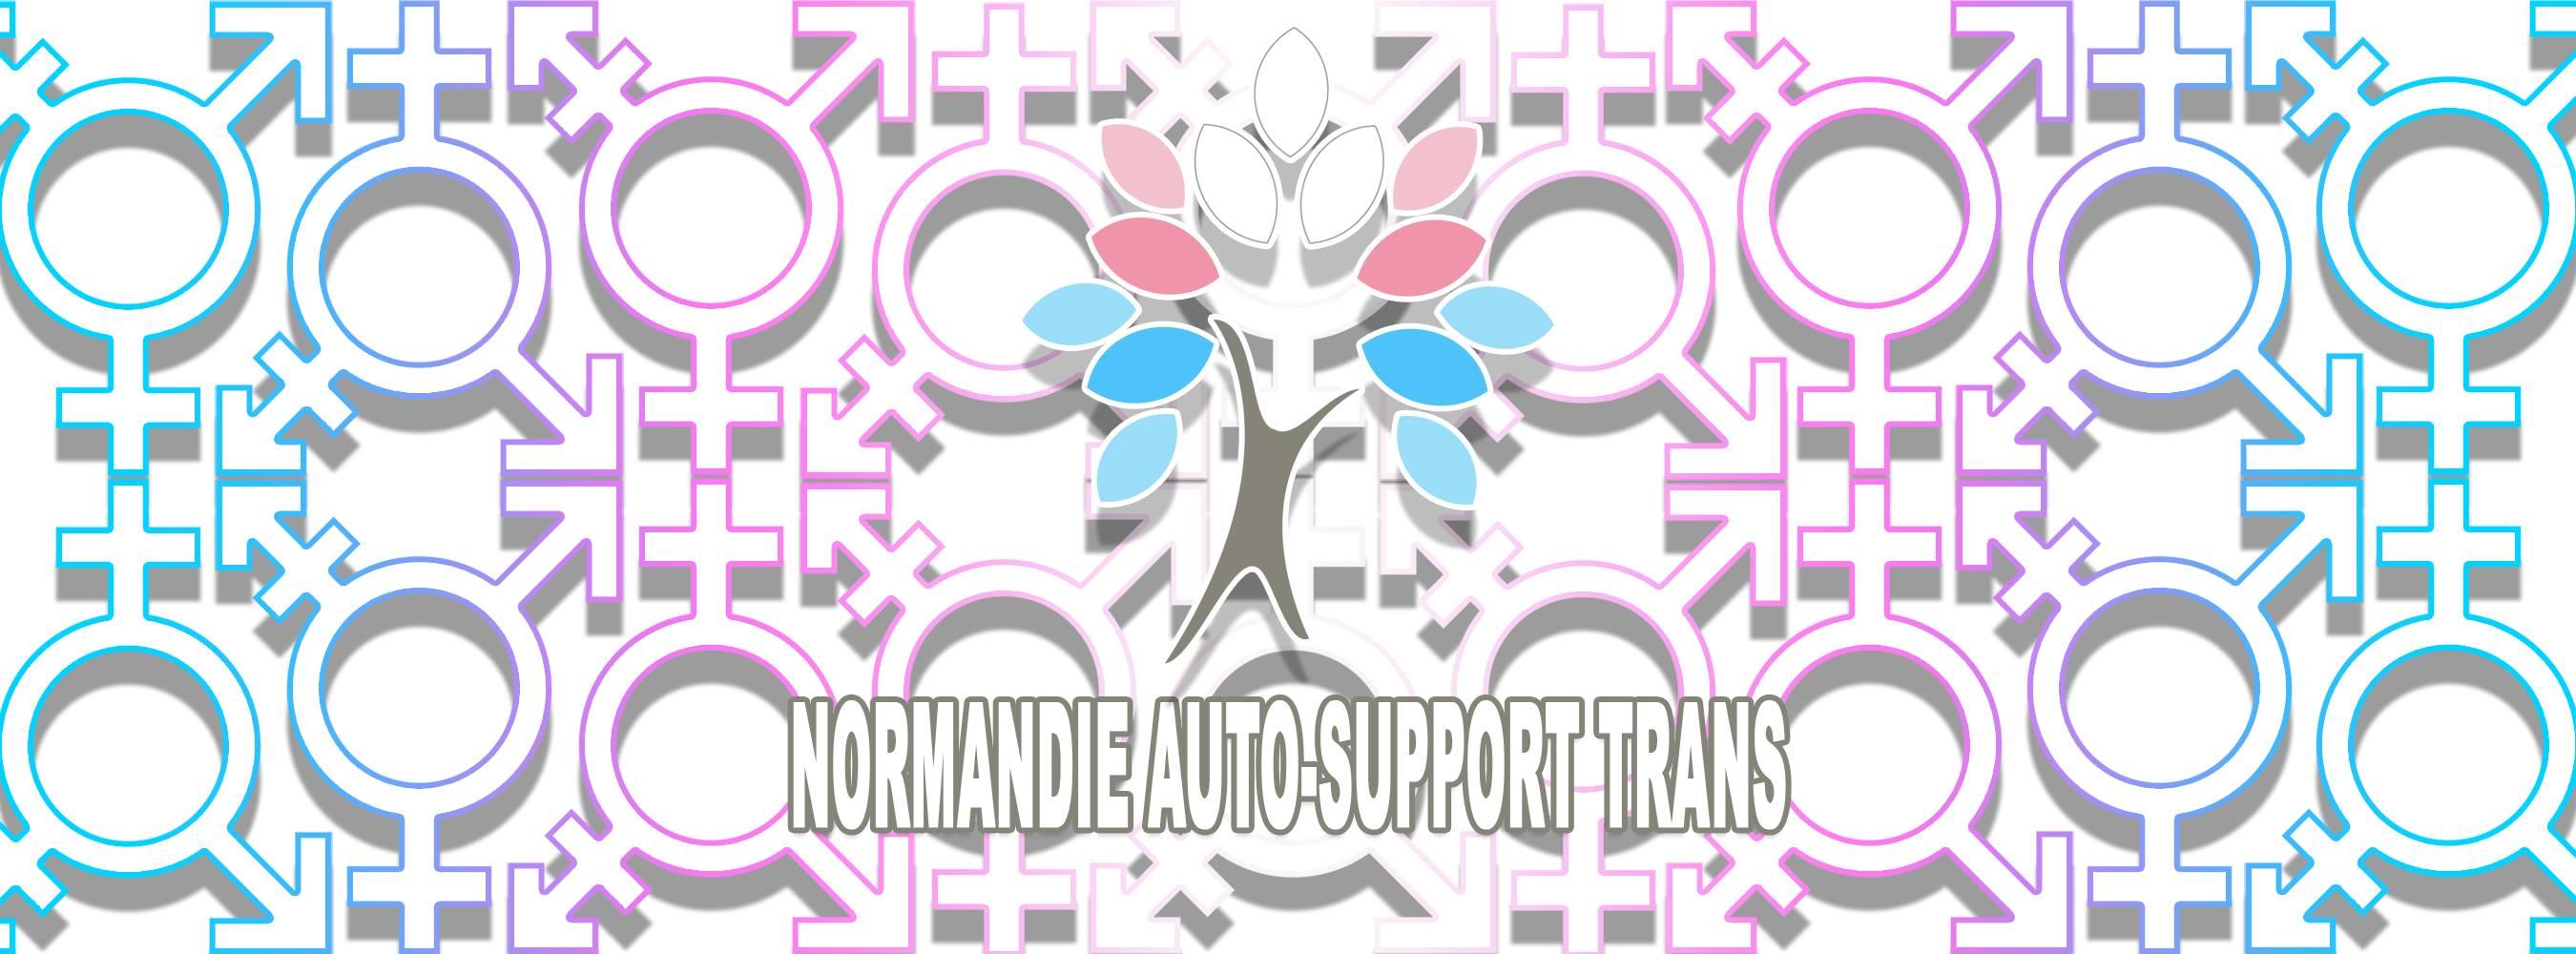 Personnes transgenres: Normandie Auto-Support Trans